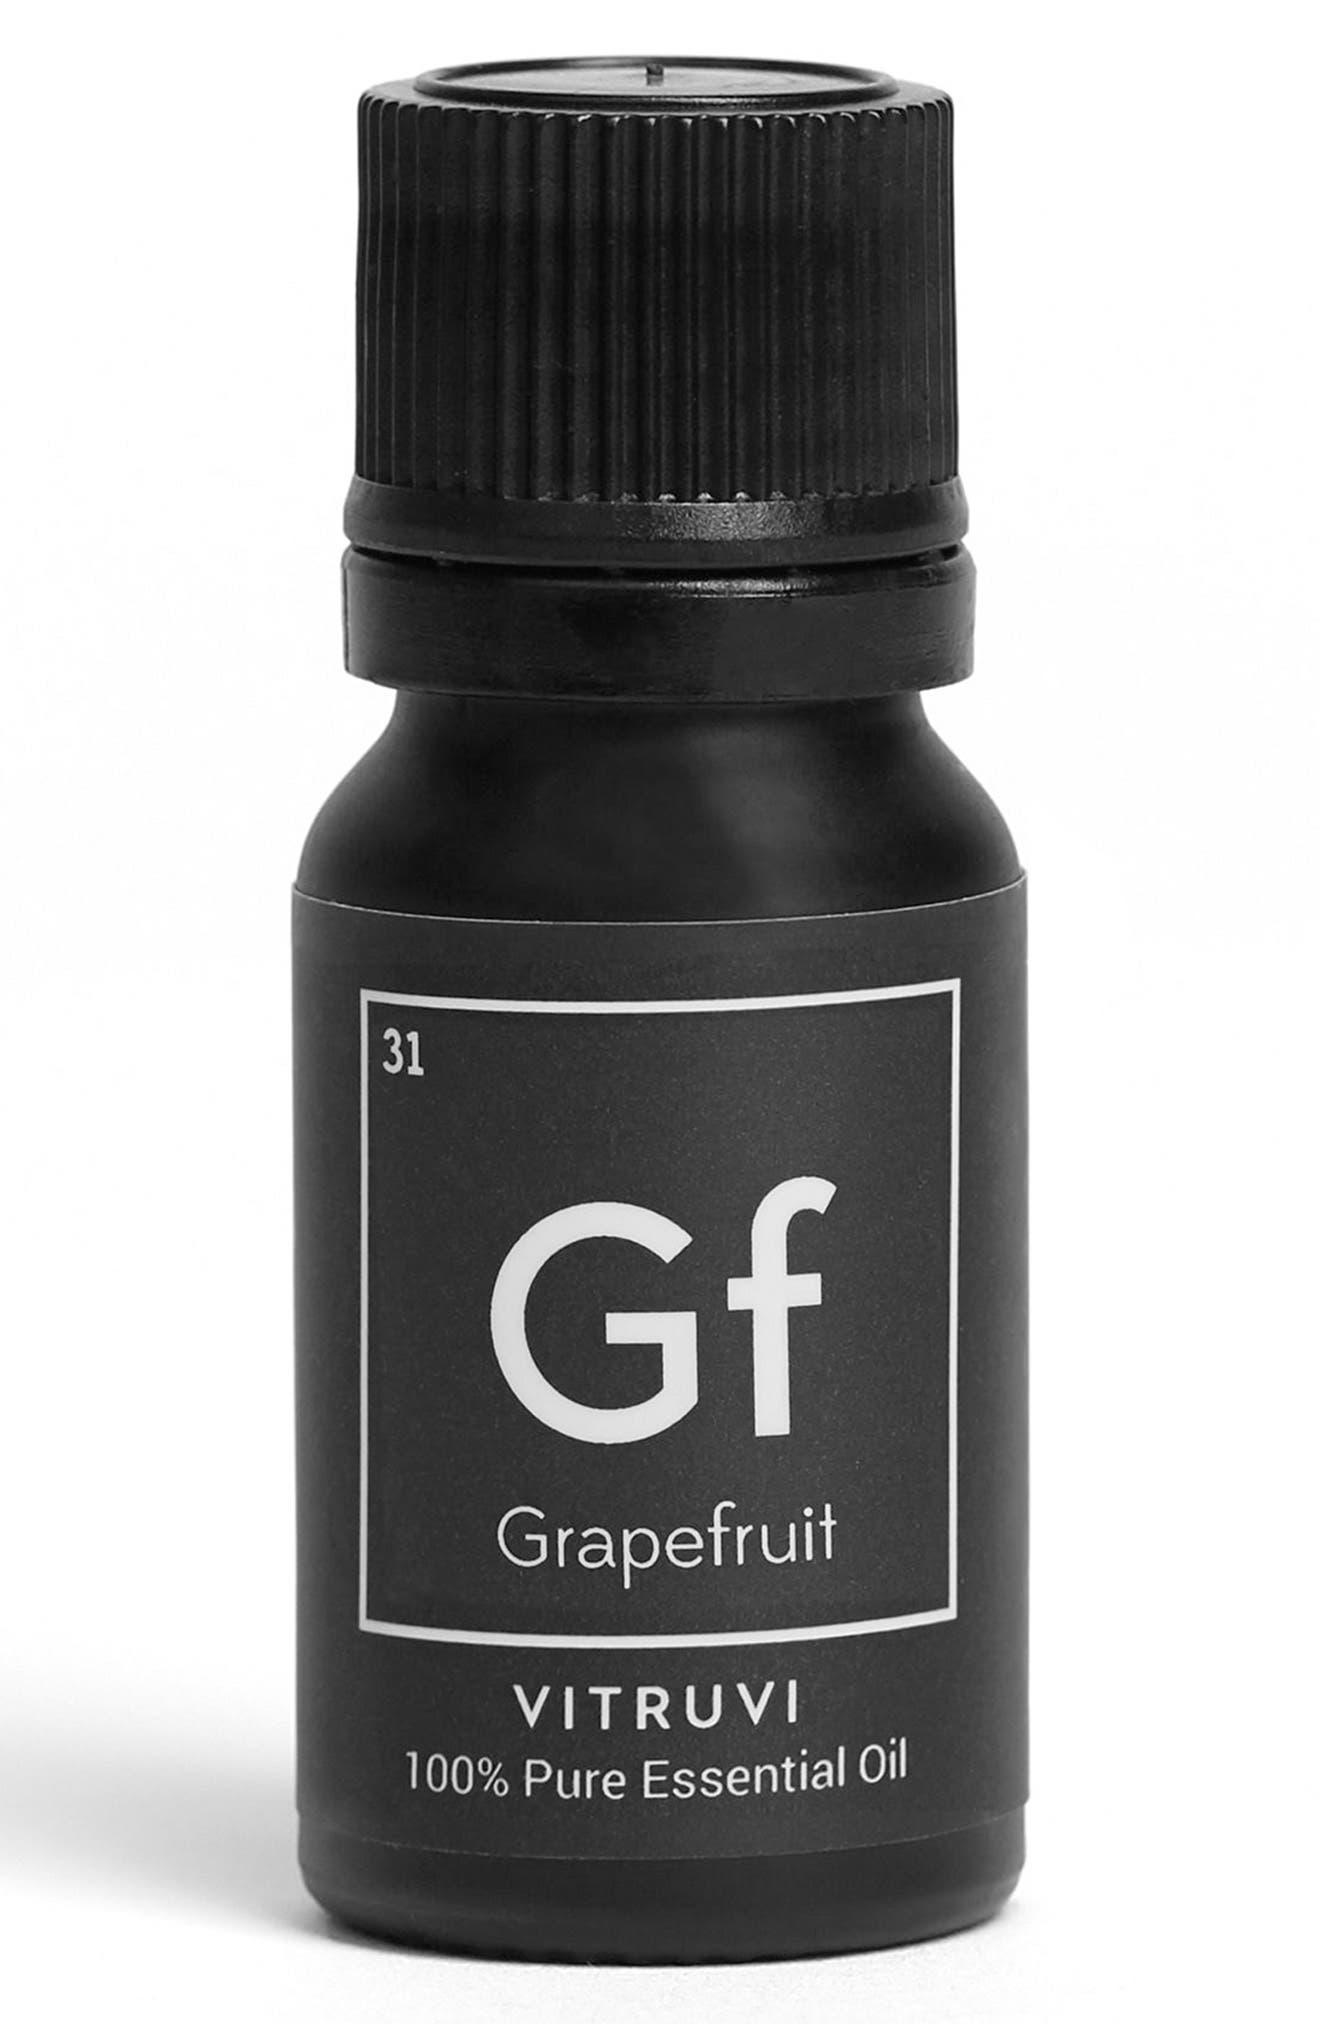 Alternate Image 1 Selected - Vitruvi Grapefruit Essential Oil